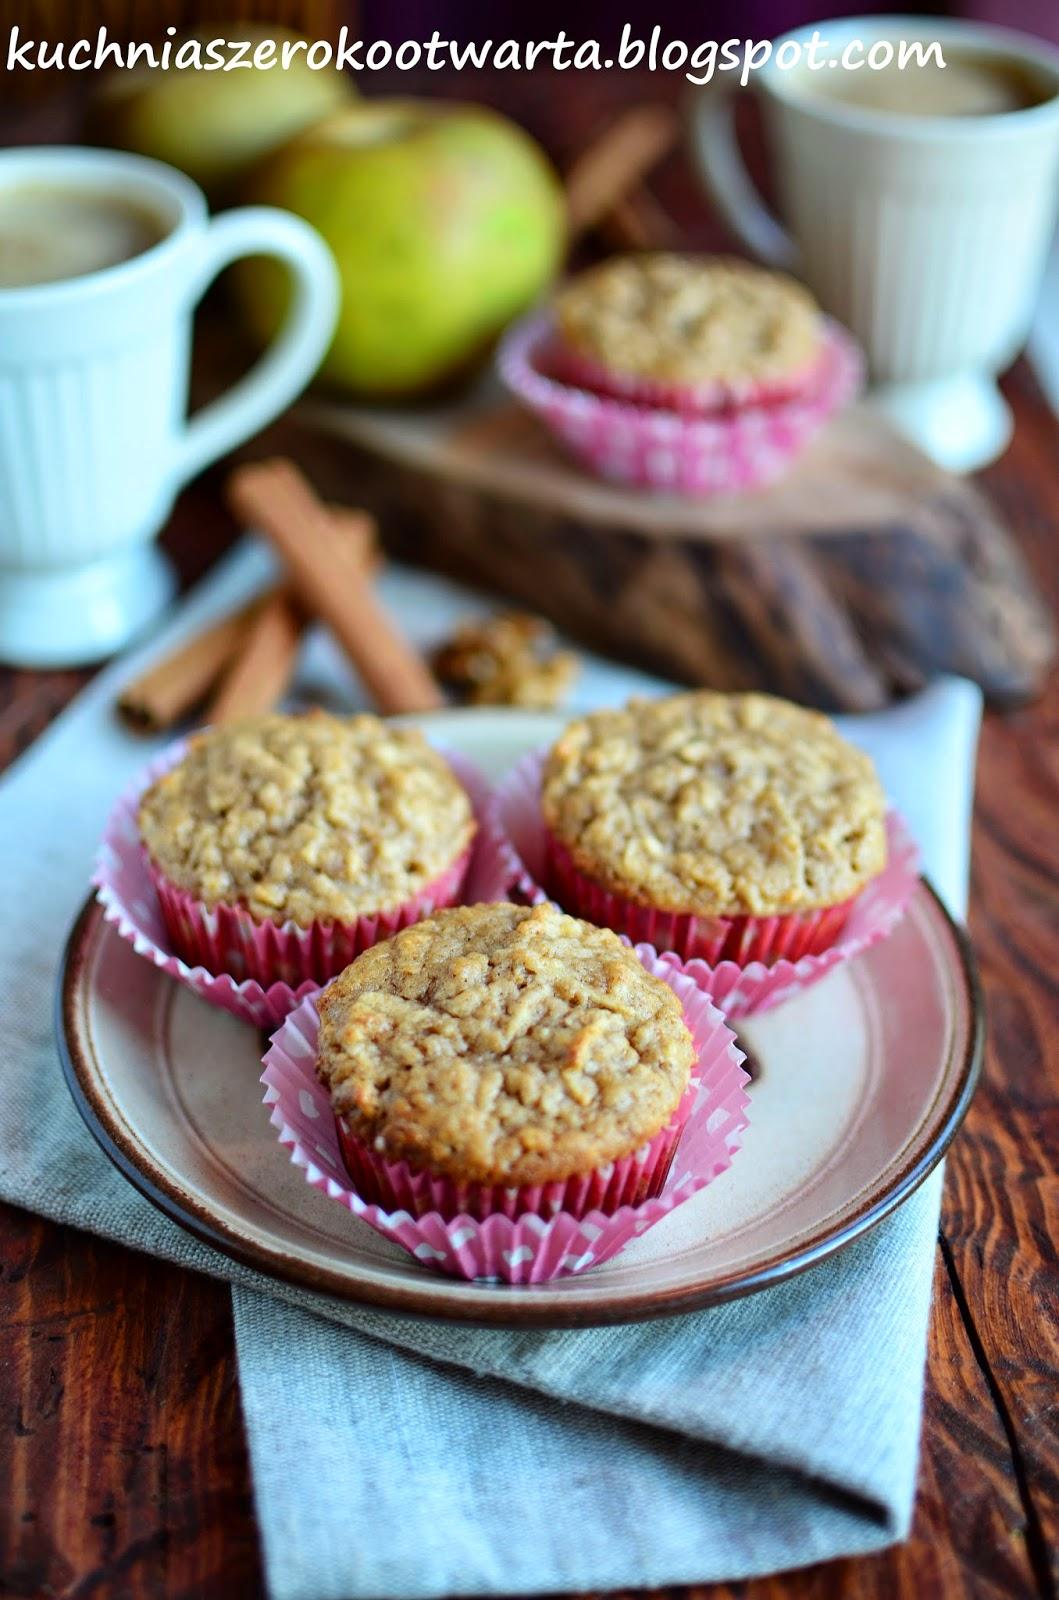 Kuchnia Szeroko Otwarta Pelnoziarniste Muffinki Z Jablkami I Orzechami